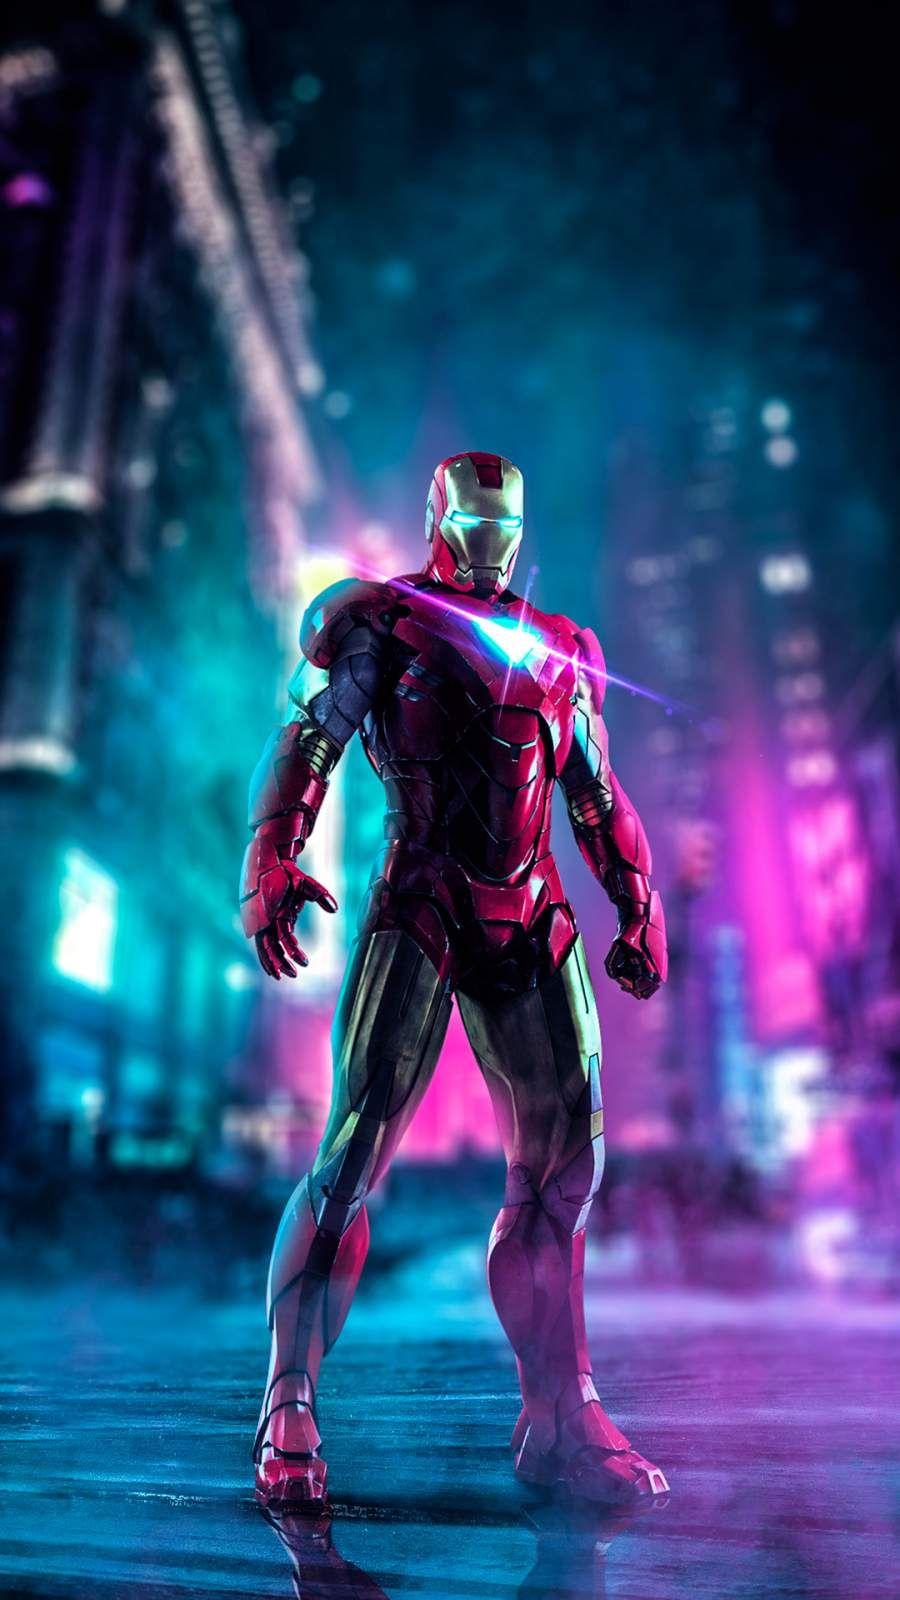 Iron Man City Art Iphone Wallpaper Iron Man Wallpaper Iron Man Hd Wallpaper Man Wallpaper